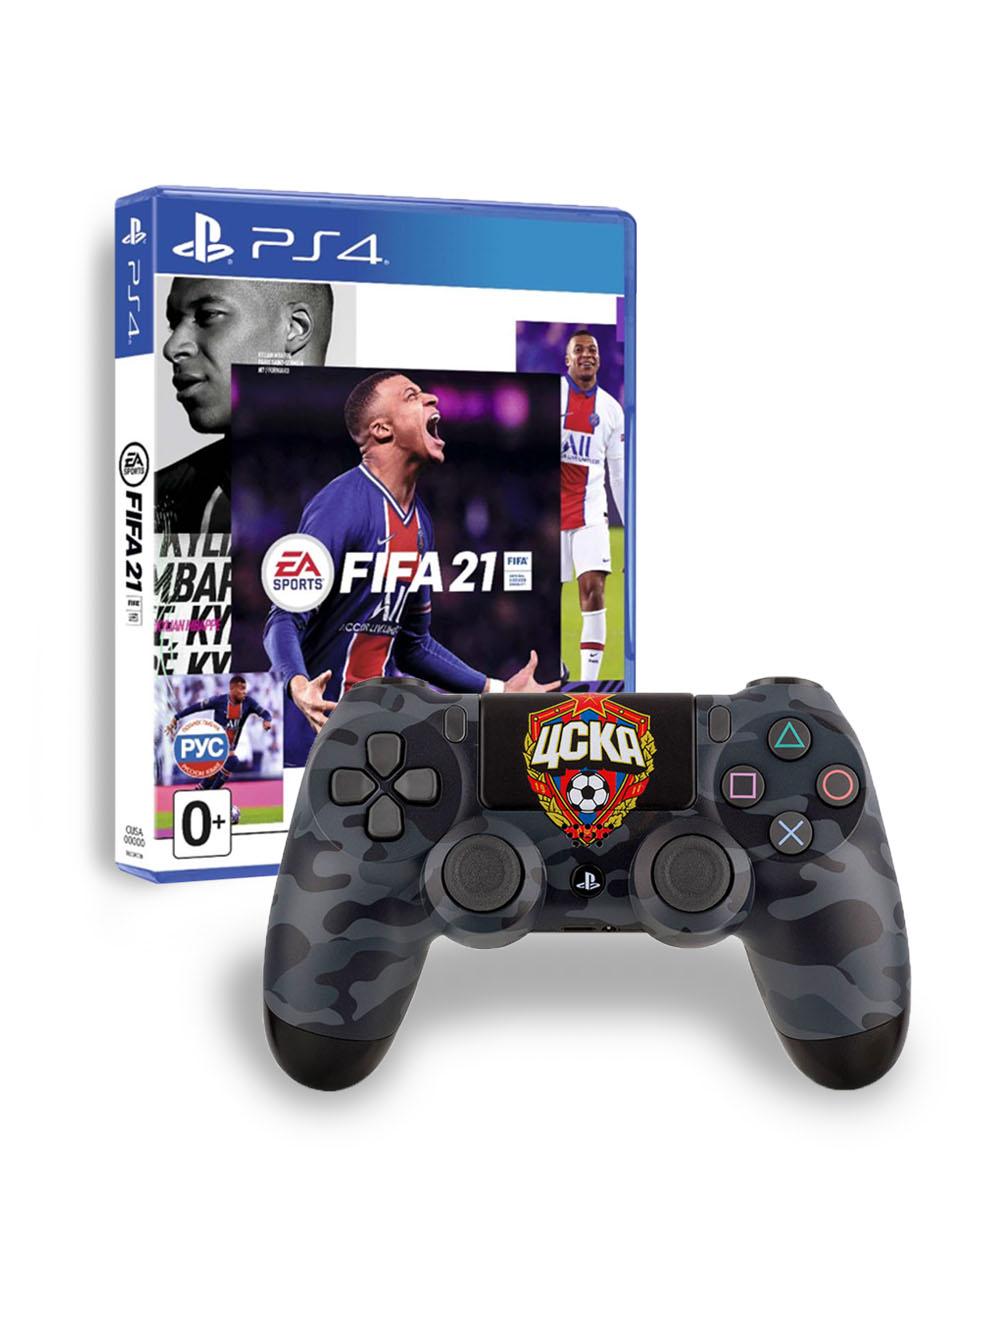 Комплект DualShock 4 ЦСКА + игра FIFA21, цвет Black Camo